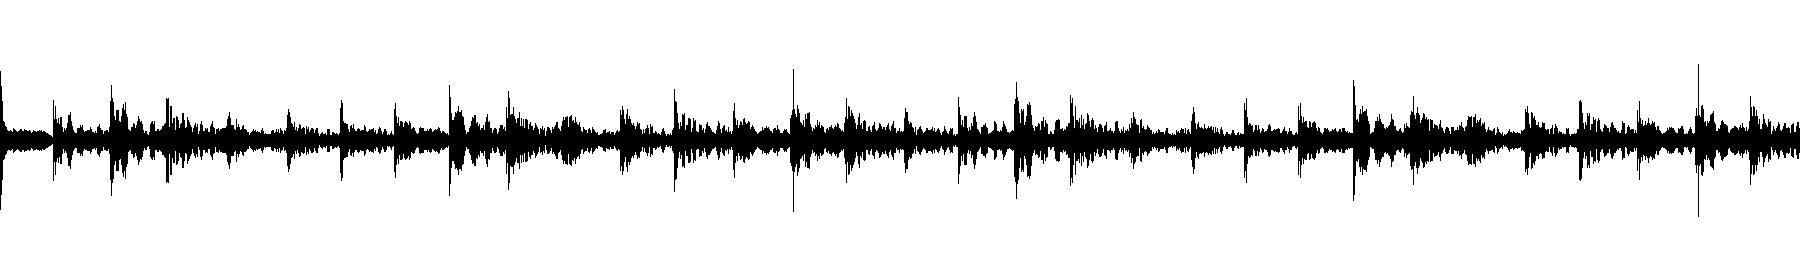 blbc cinedrumsb 75 02